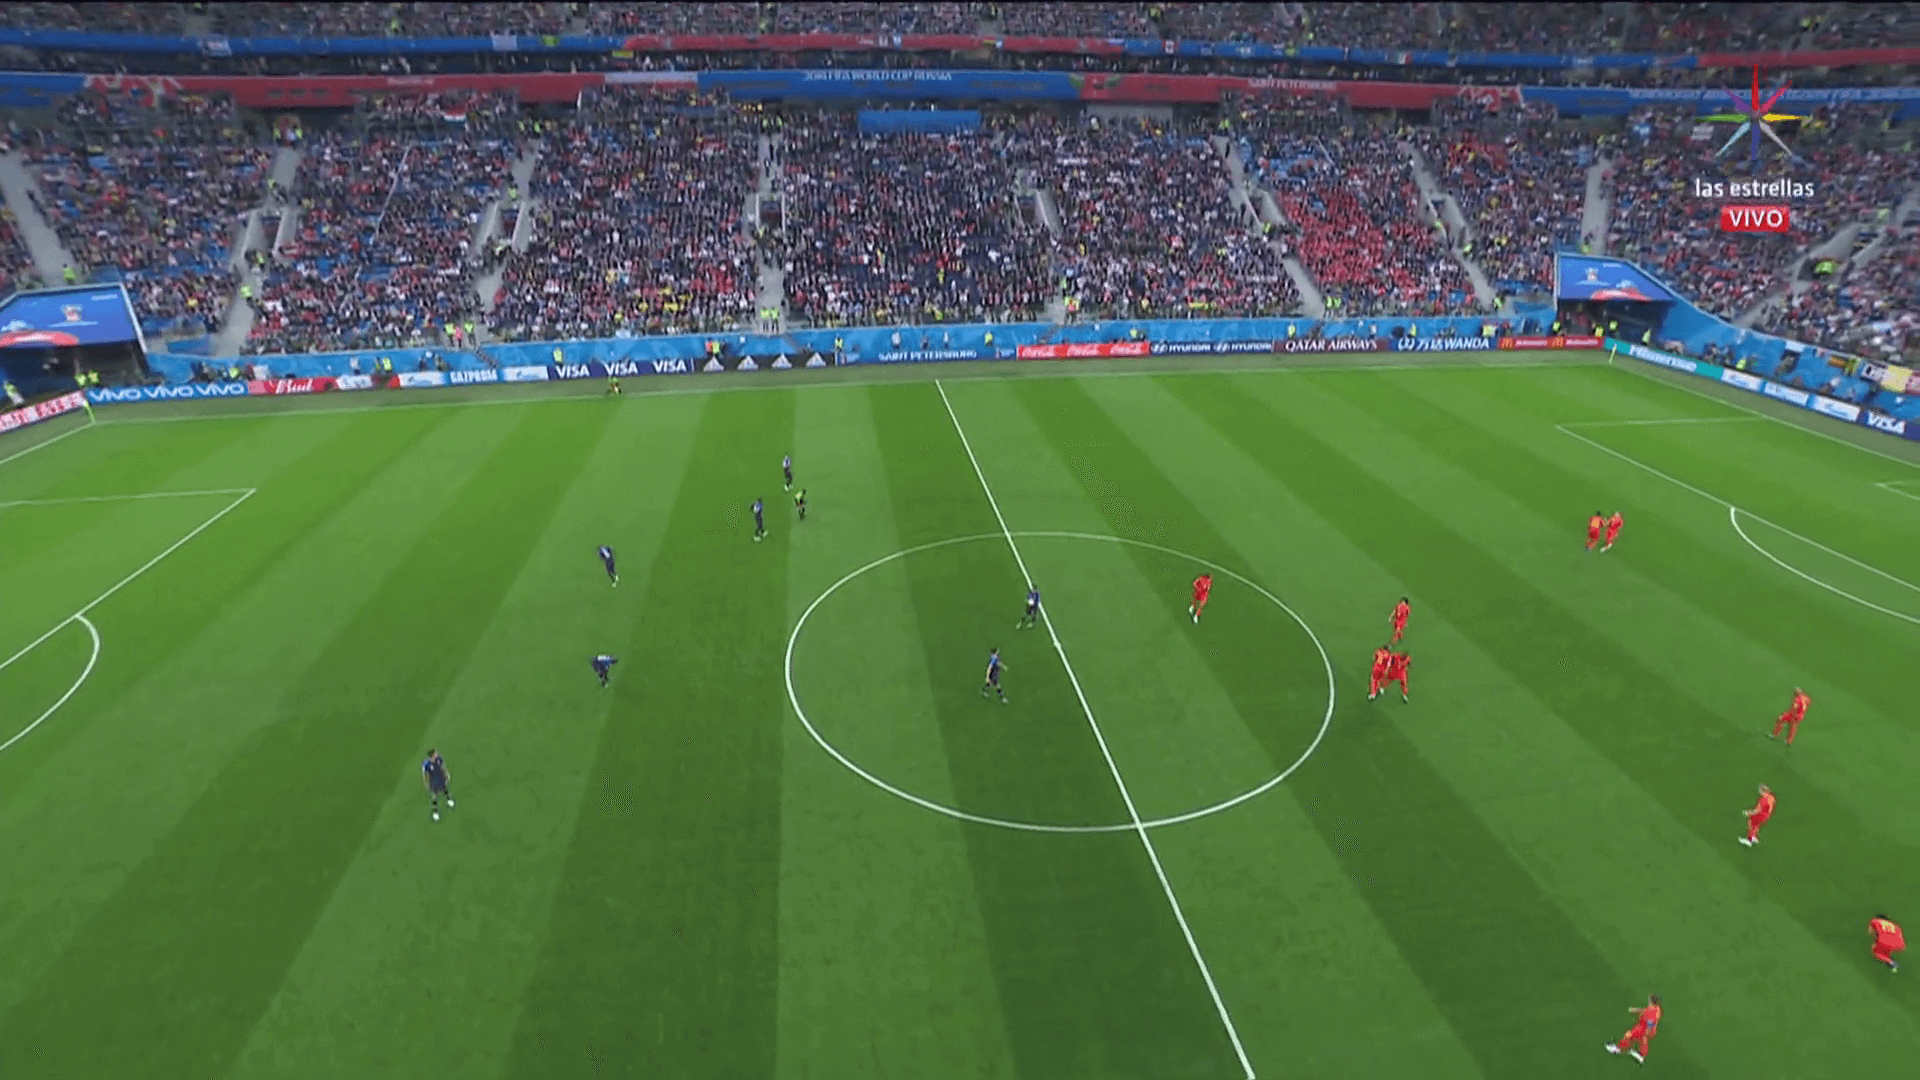 Francia vs Bélgica match